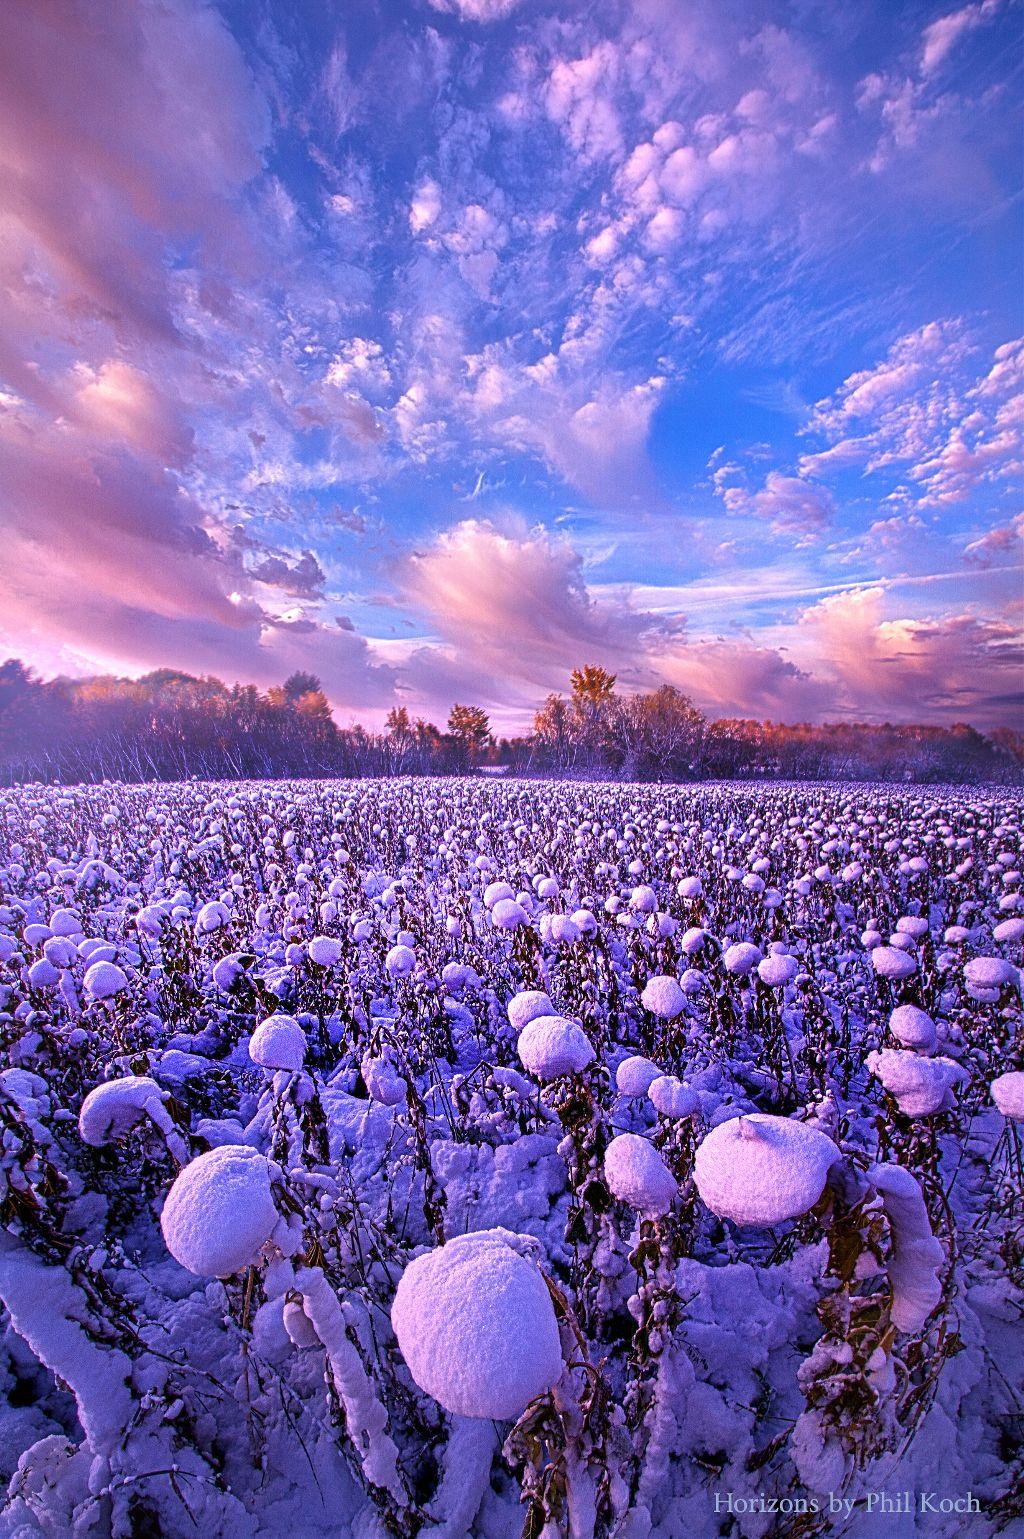 """ Snow Flowers "" - Wisconsin Horizons by Phil Koch. #landscapephotography  #freetoedit #remixit #clouds #naturephotography #peace #beauty #beautiful #pretty #life #winter #snow #purple #earth #peaceful #sunrise #sunset #autumn #nature"